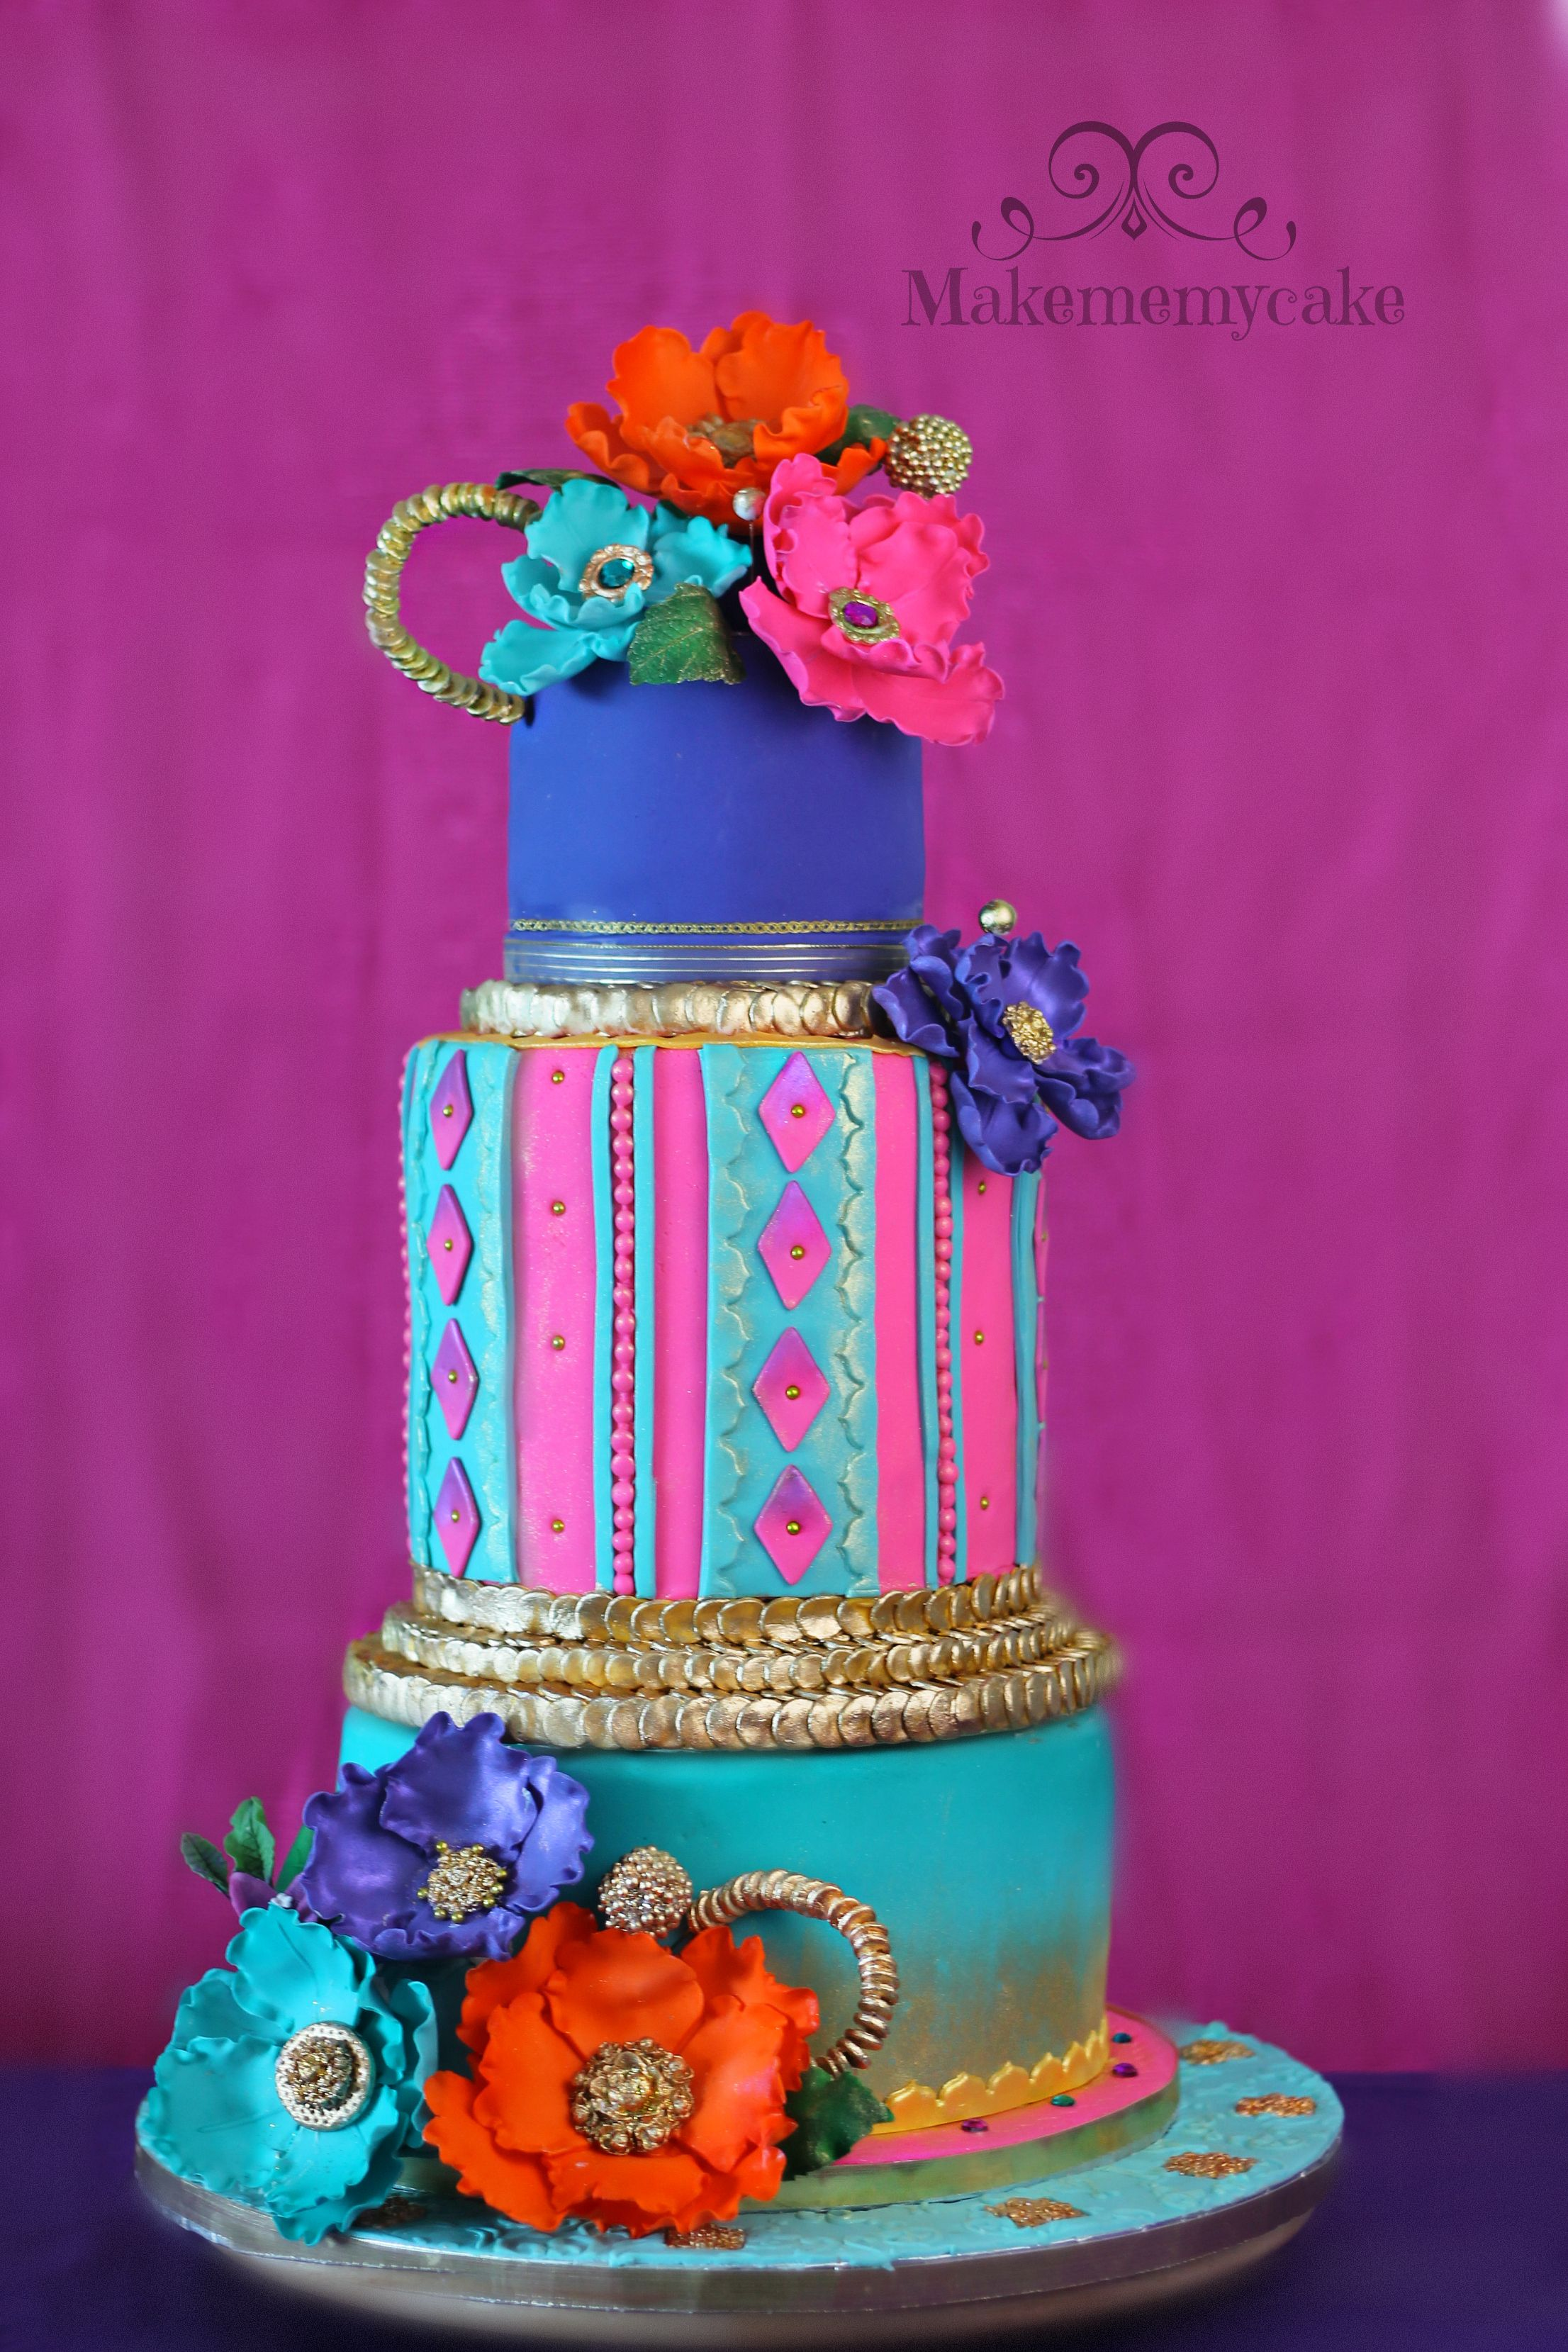 bollyboodcake by Makememycake | Sweet Confection | Pinterest ...